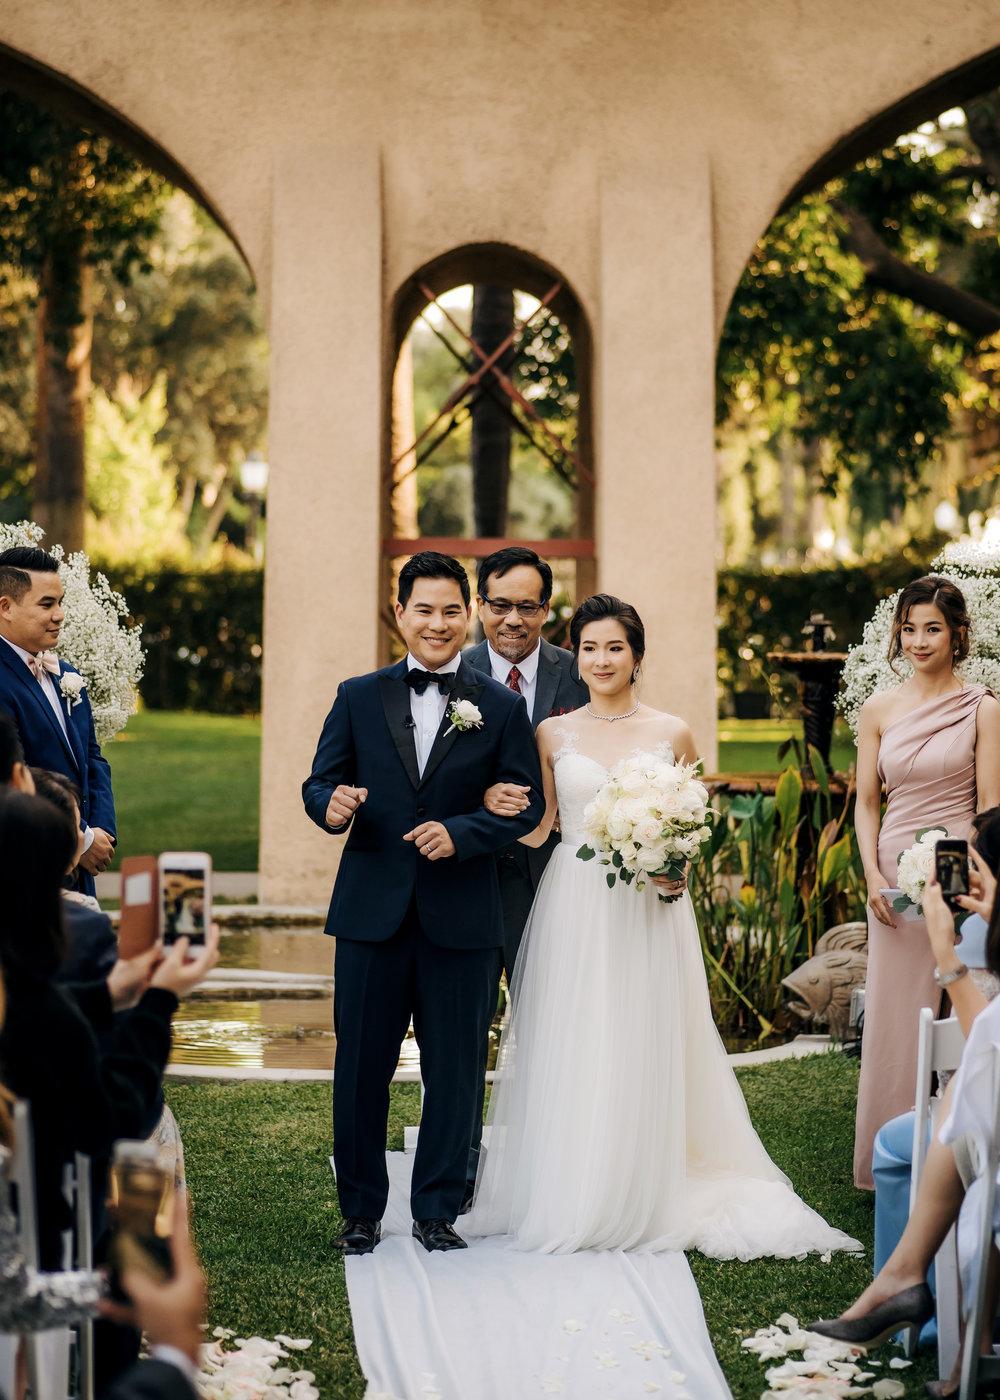 Turchin_20181014_Prim-Jacky-Wedding_240.jpg